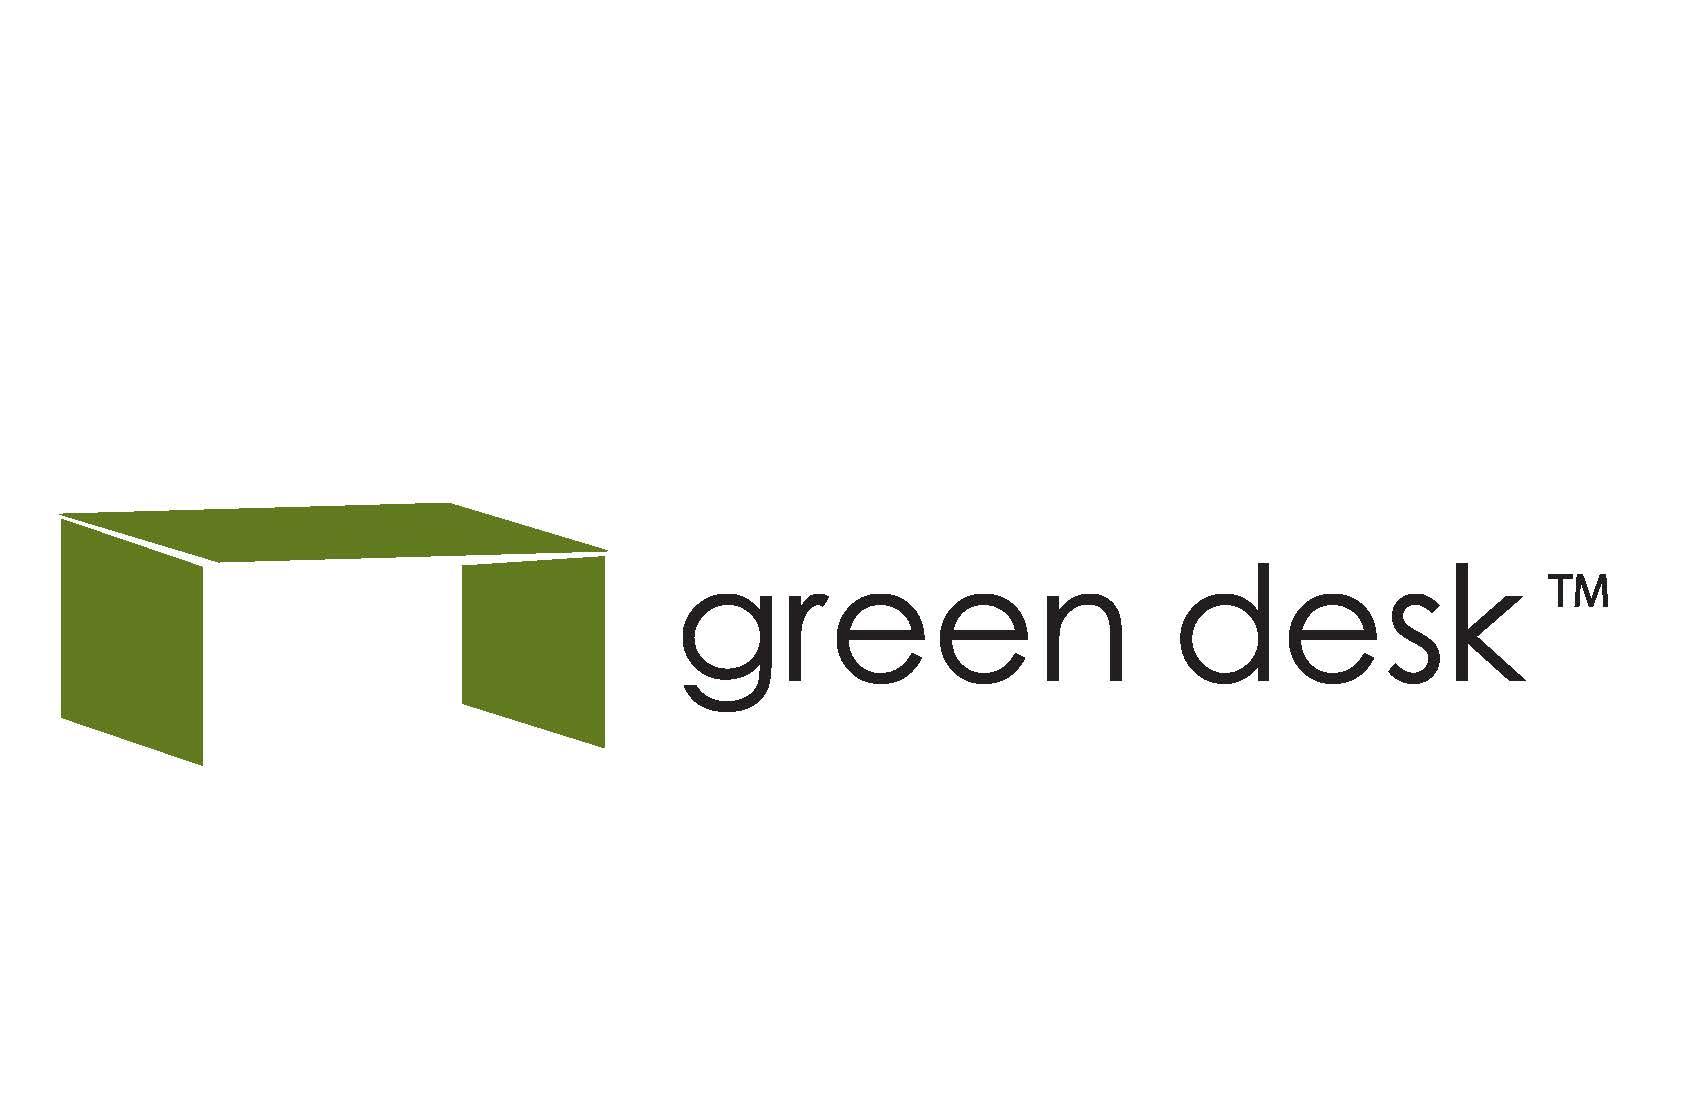 greendesk logo big.jpg